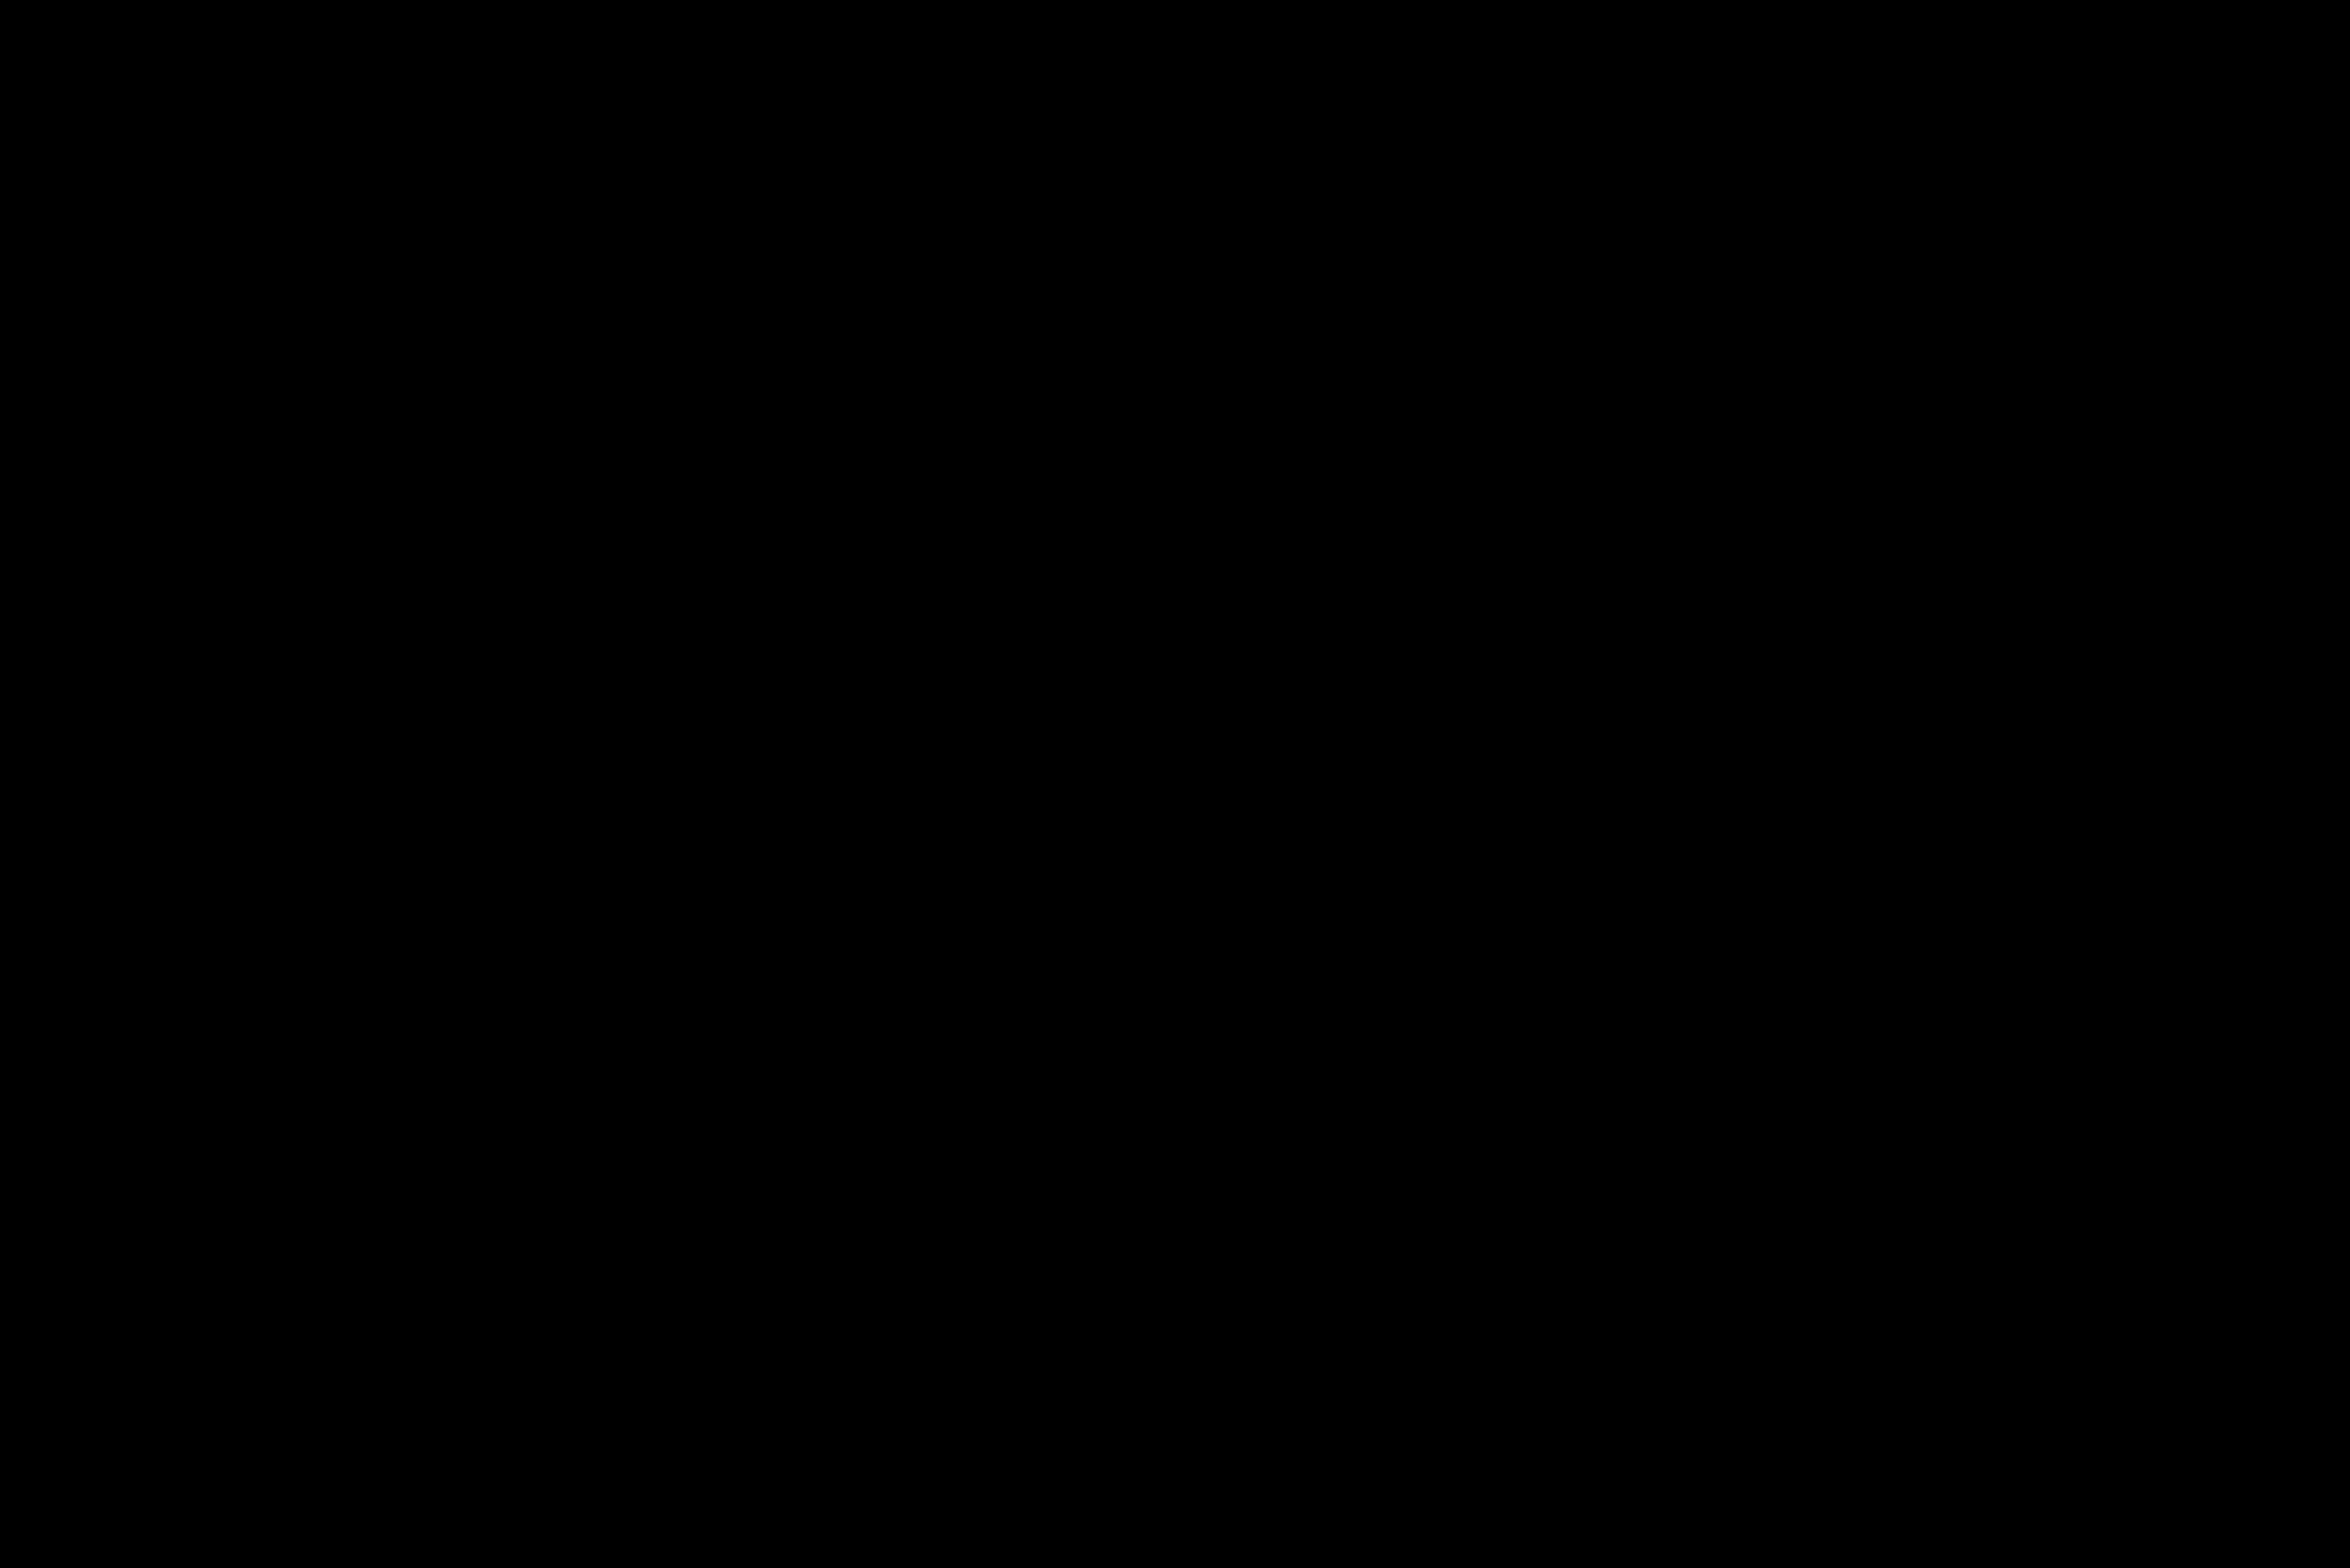 Rooibos certified by EU